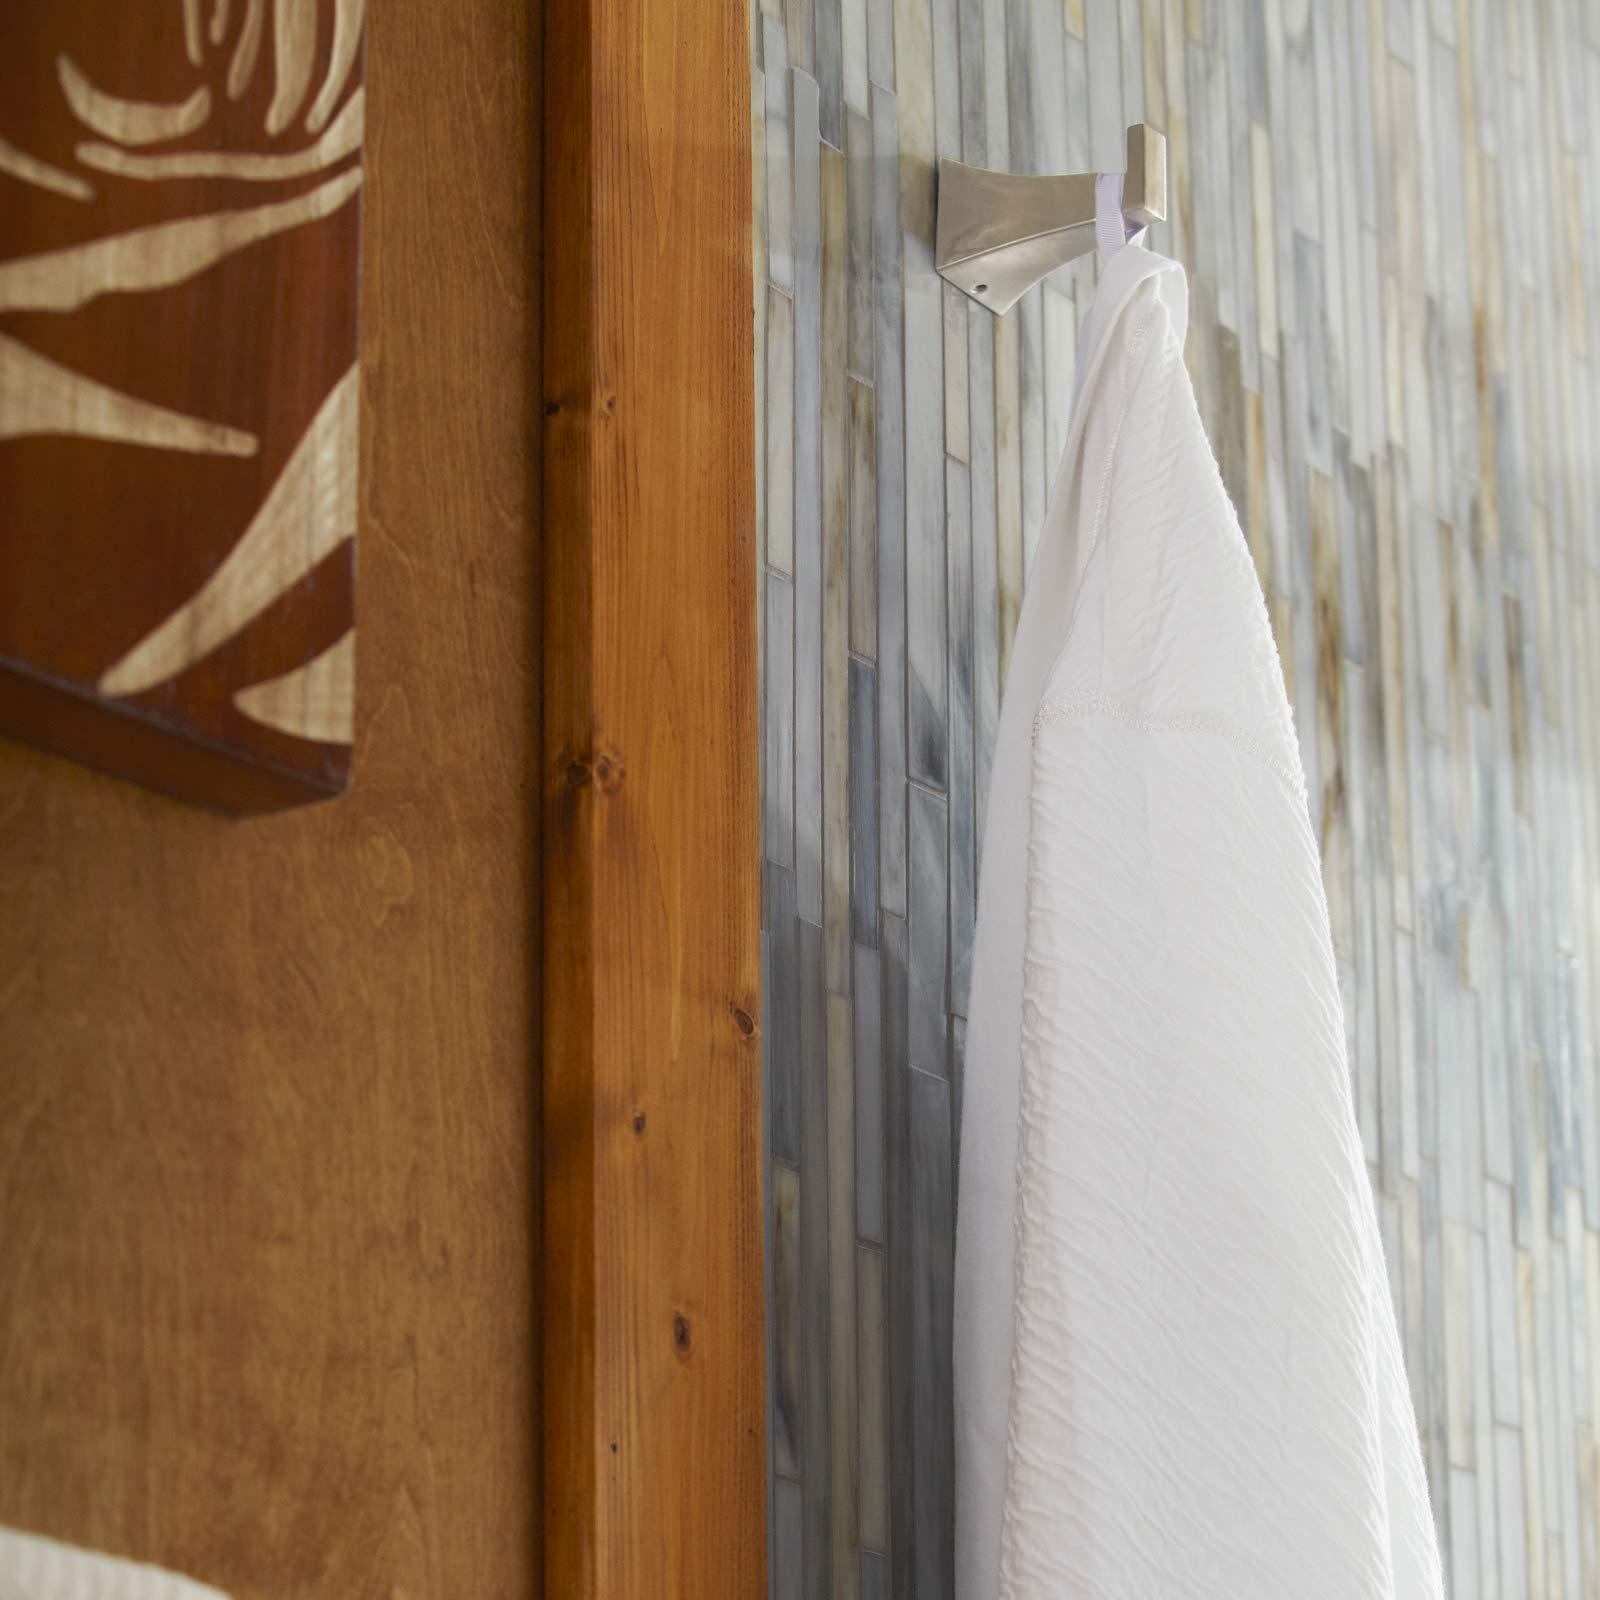 Mirabelle MIRVLRHPN Vilamonte Wall Mounted Single Robe Hook